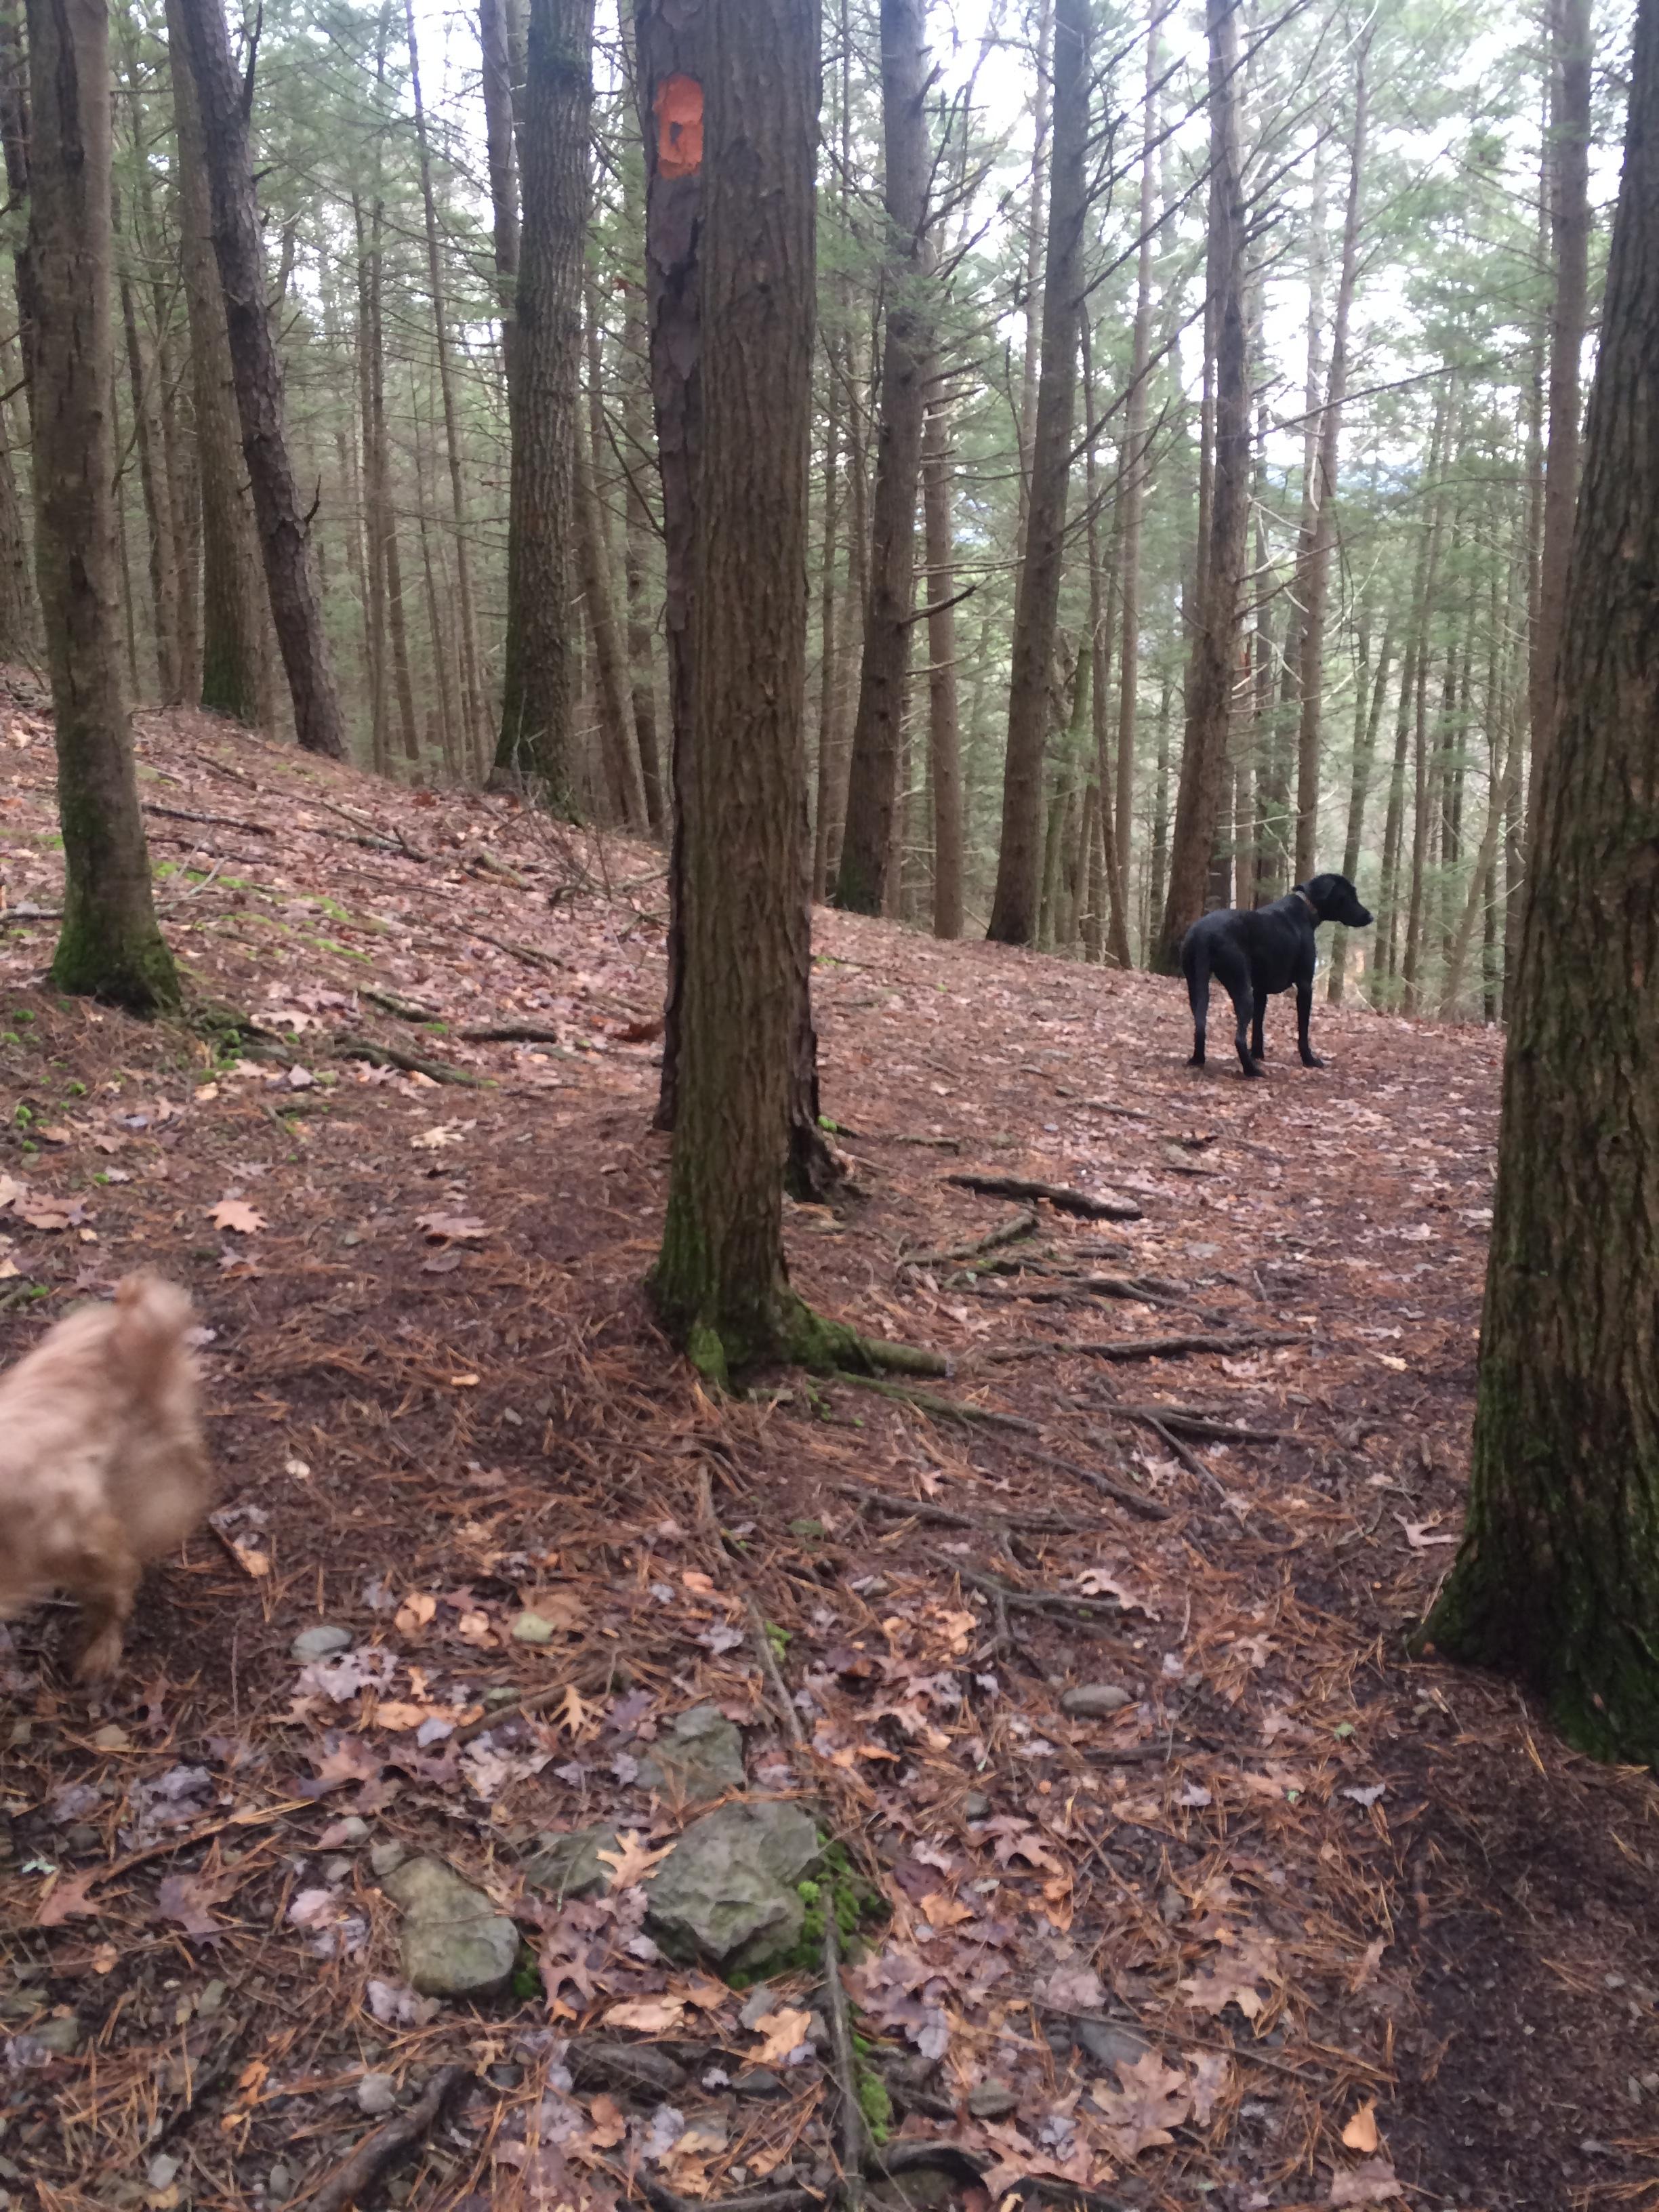 Cruzan (the tall, black dog) and Maggie (the reddish blur in the bottom left corner) enjoying the woods.